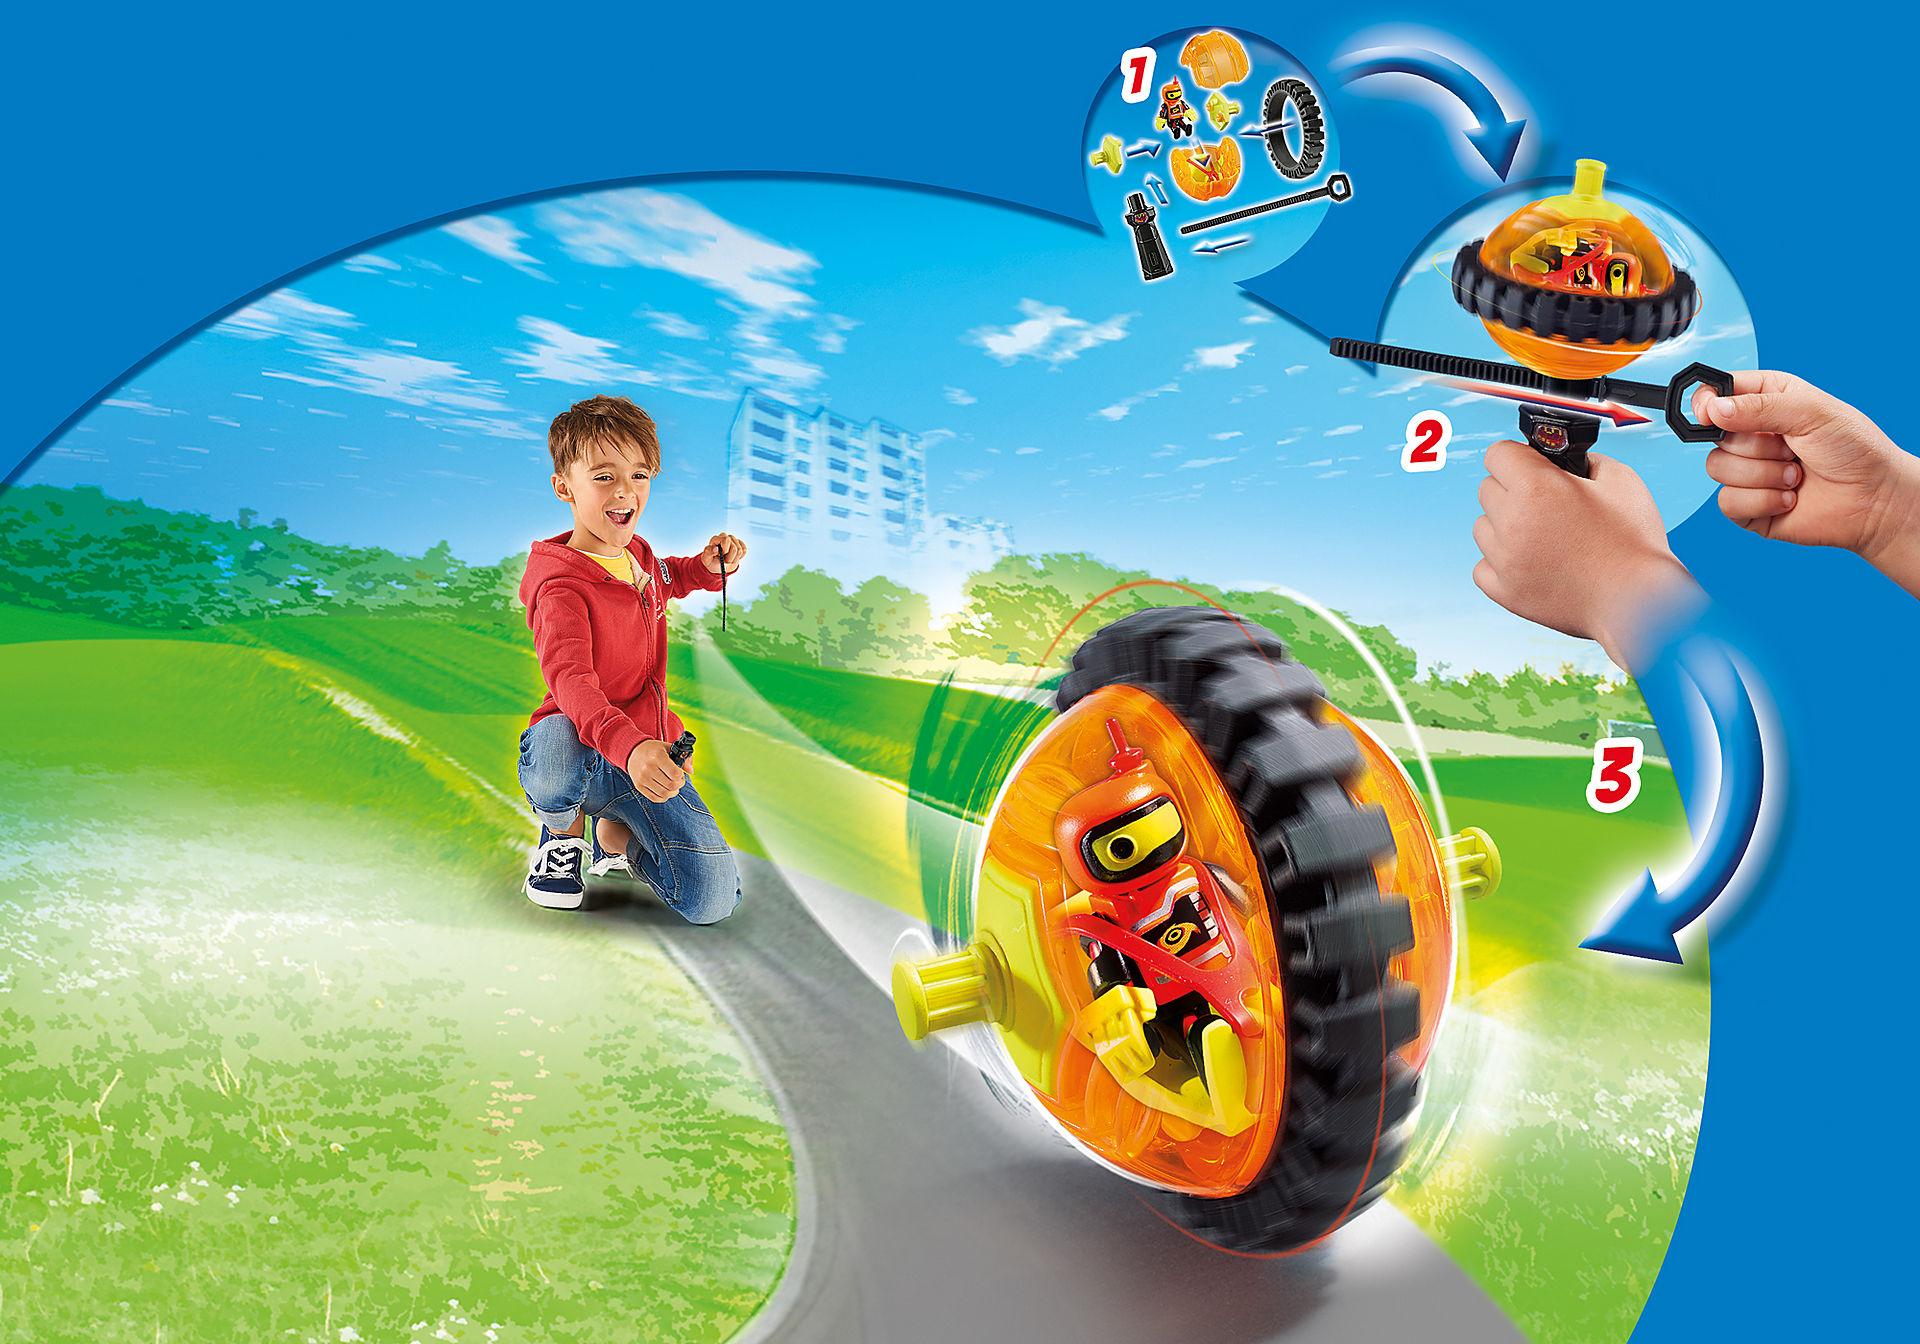 http://media.playmobil.com/i/playmobil/9203_product_extra1/Orange Roller Racer